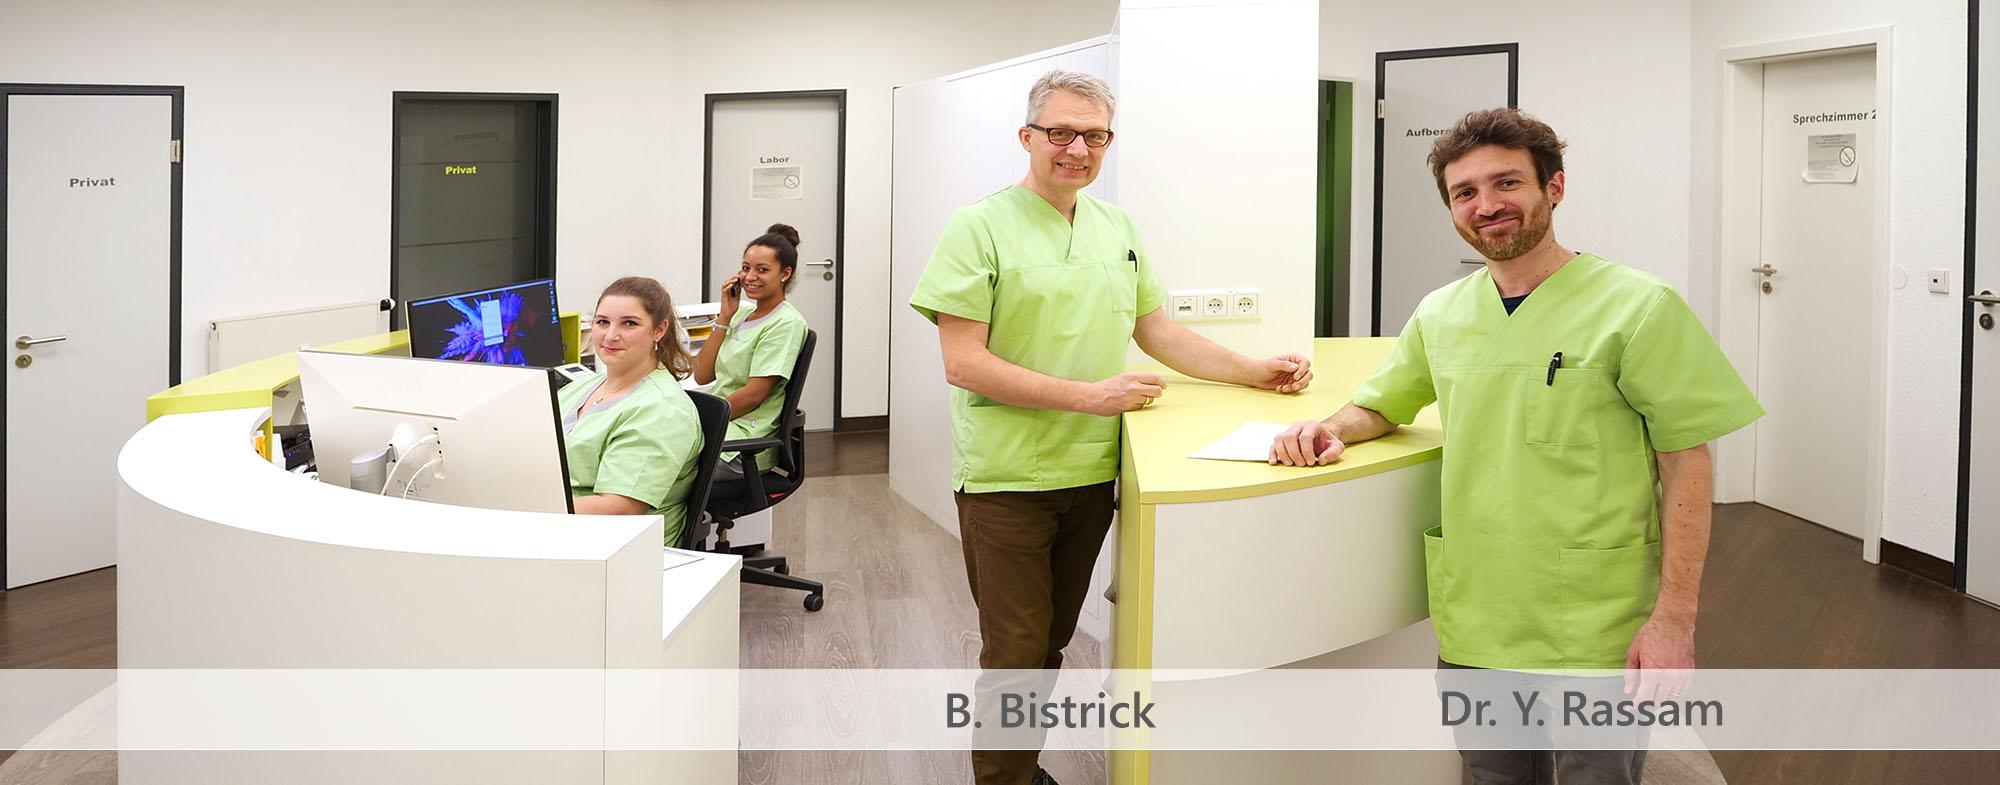 Urologe B. Bistick, Dr. Y. Rassam, Hamm: Prostatakarzinom, Vasektomie